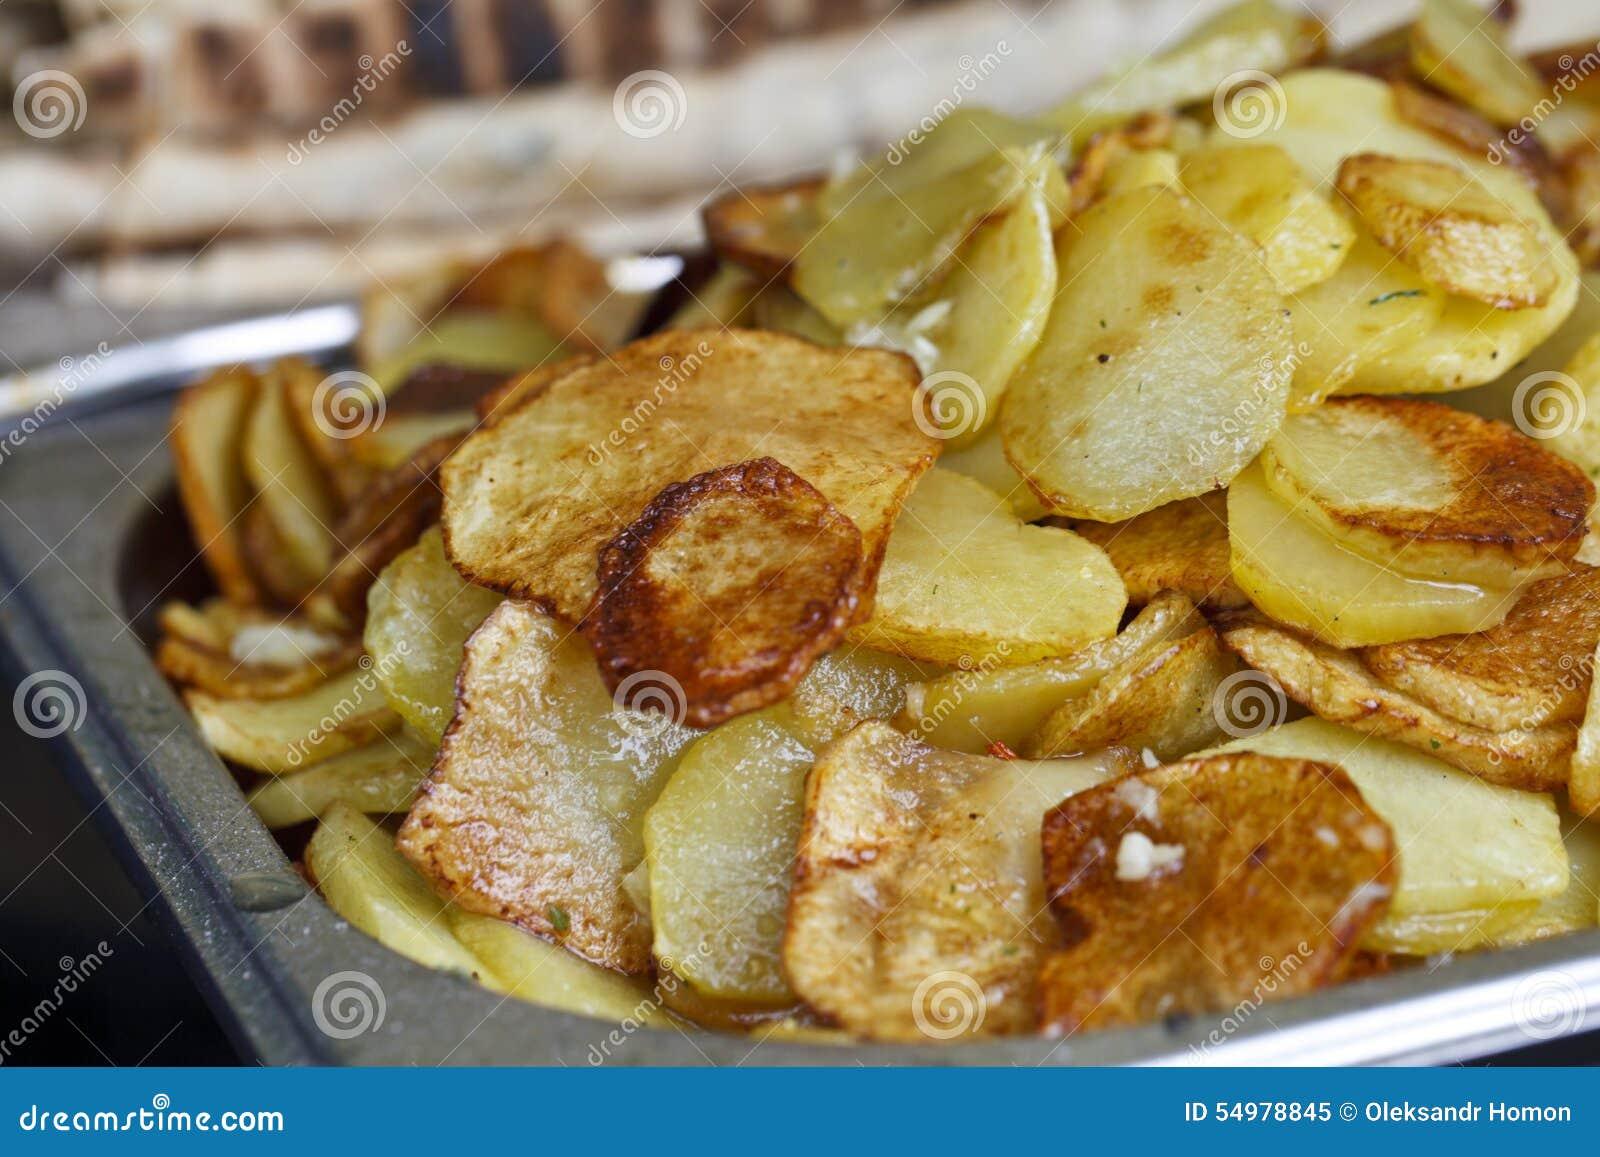 Juicy fried potatoes